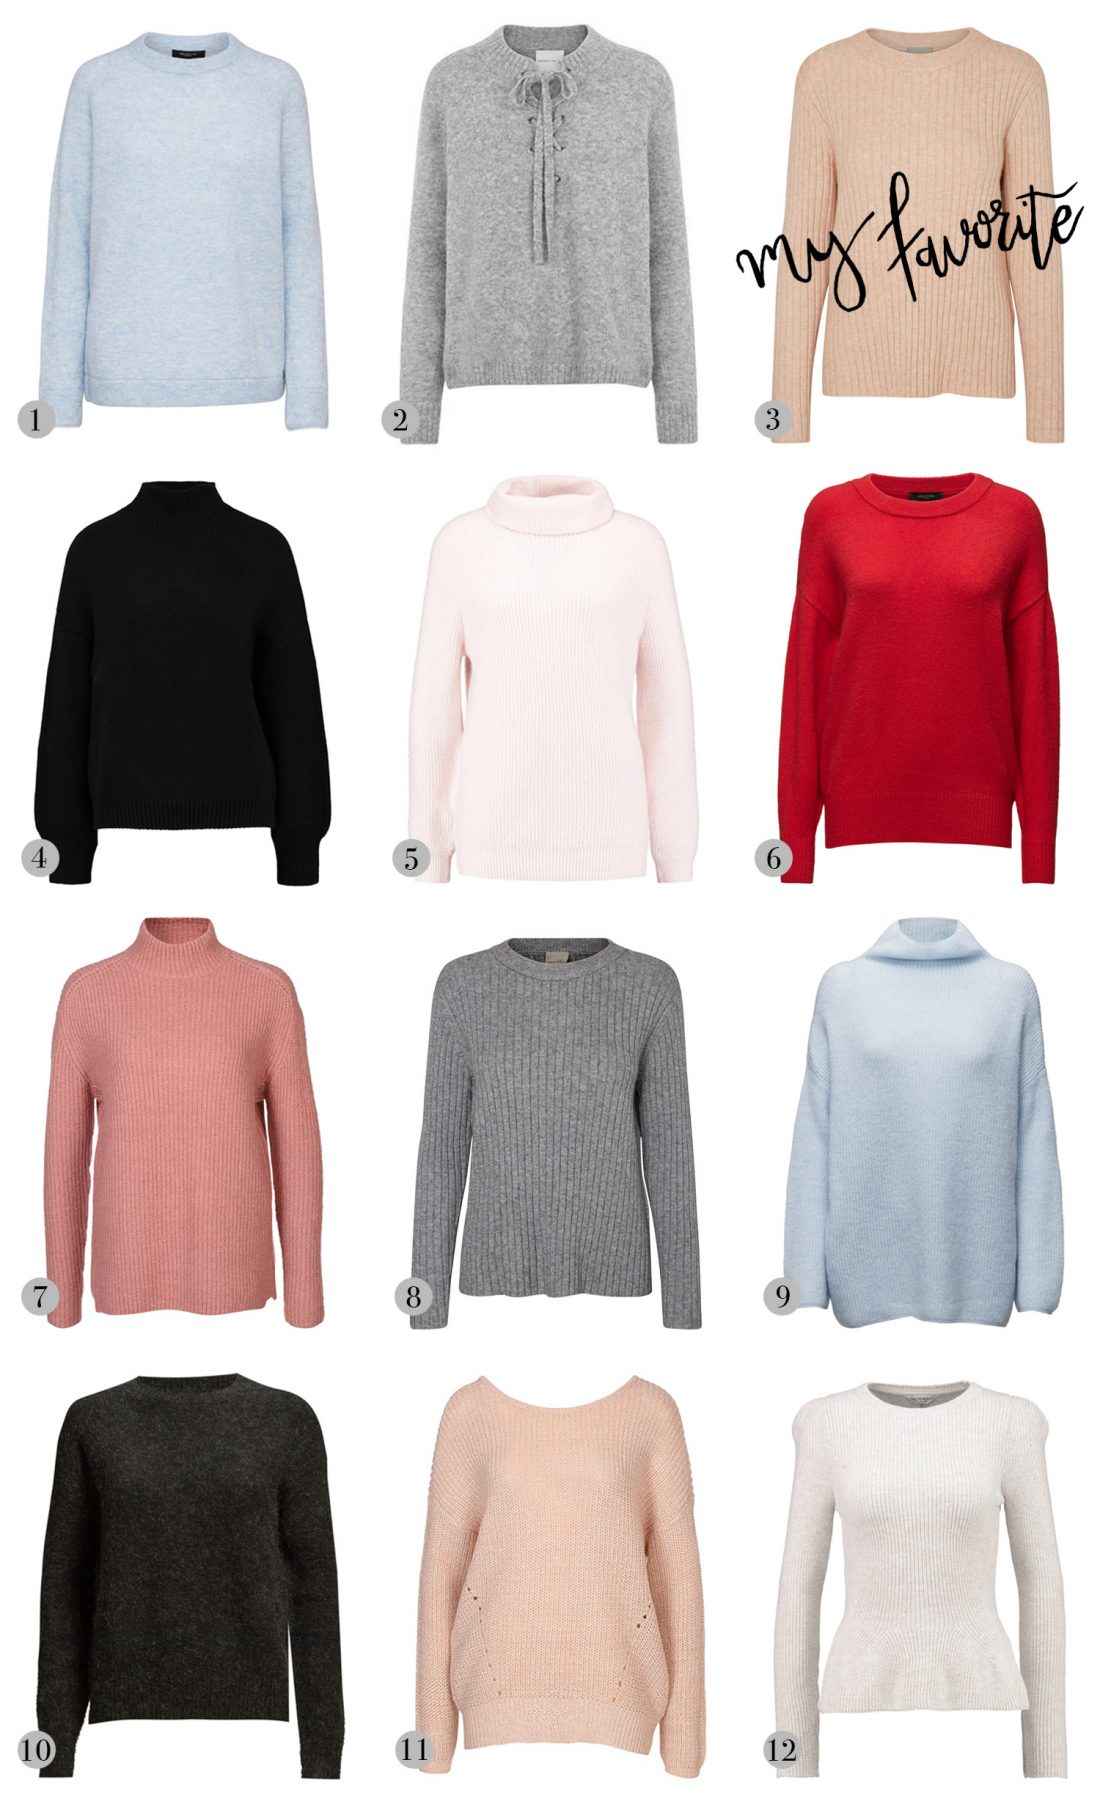 striktrøje, sweater, strik, boozt